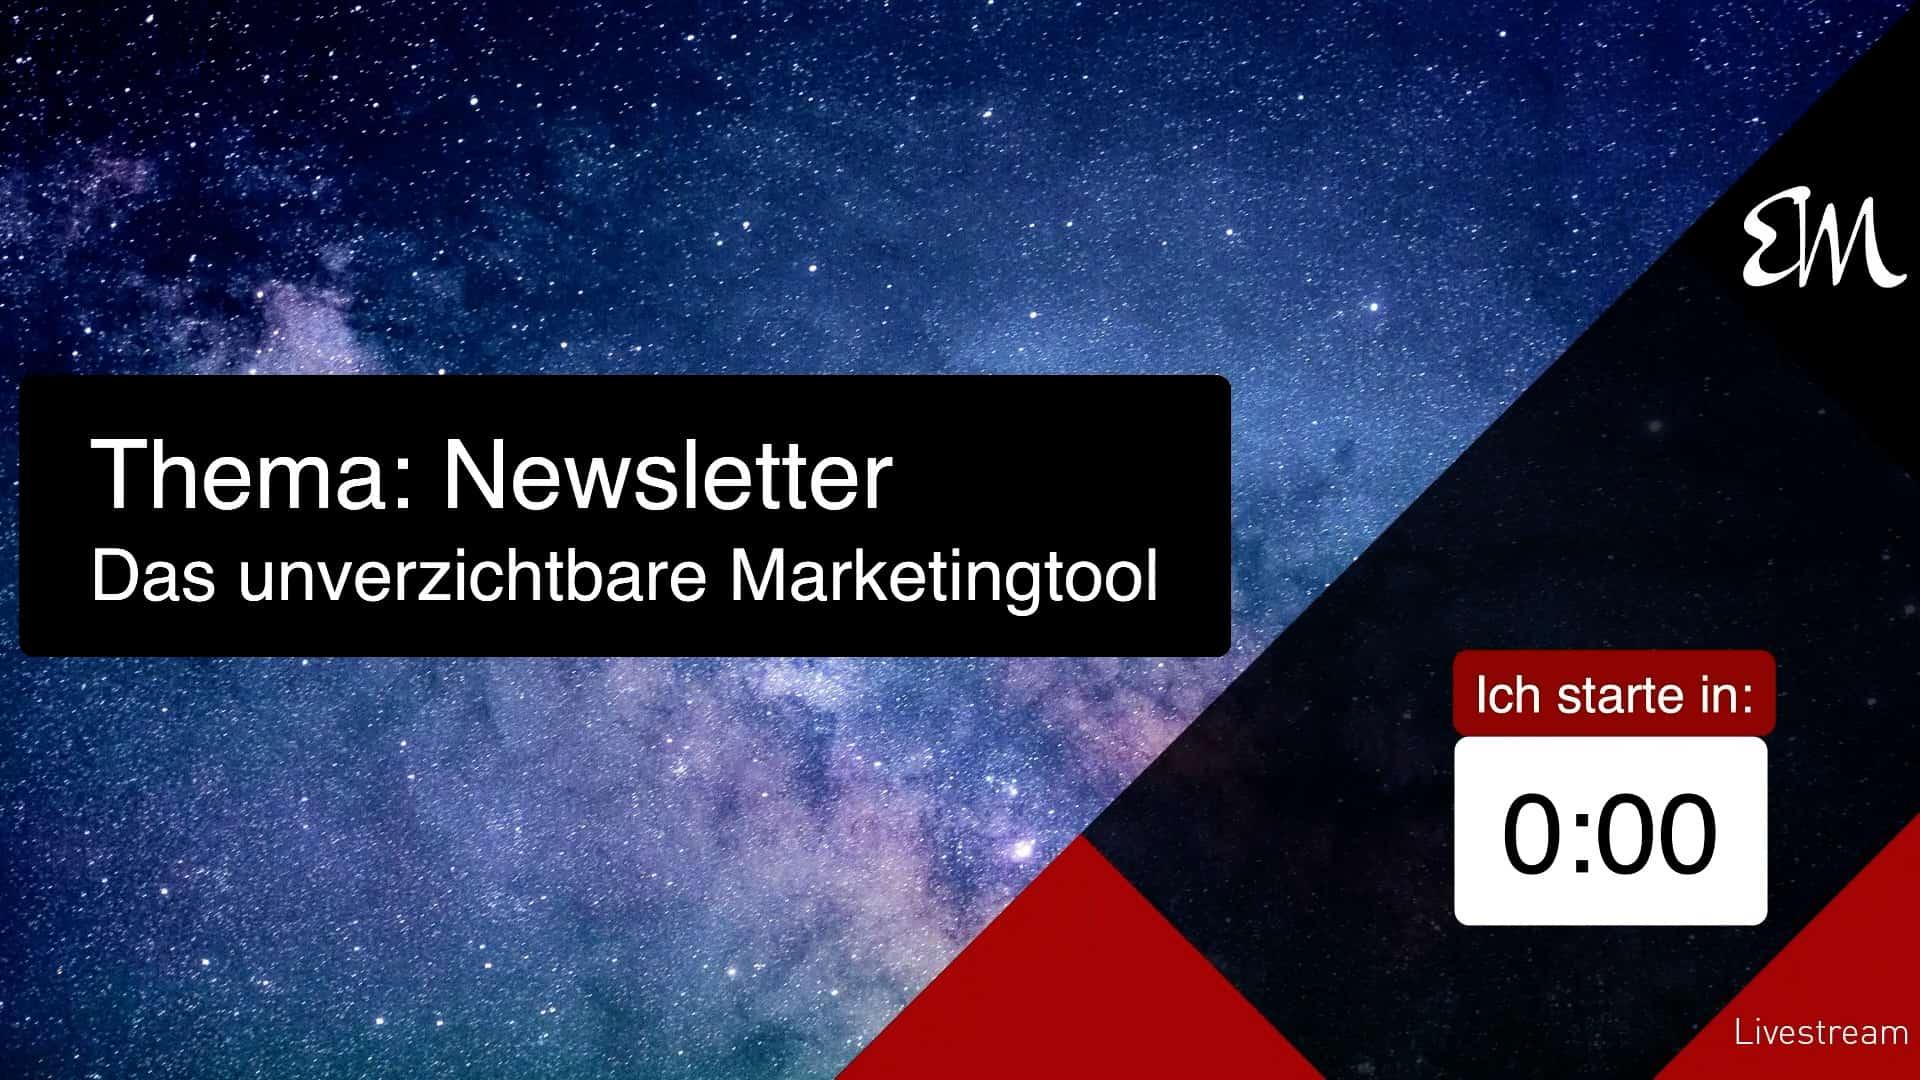 Newsletter, das unverzichtbare Marketingtool